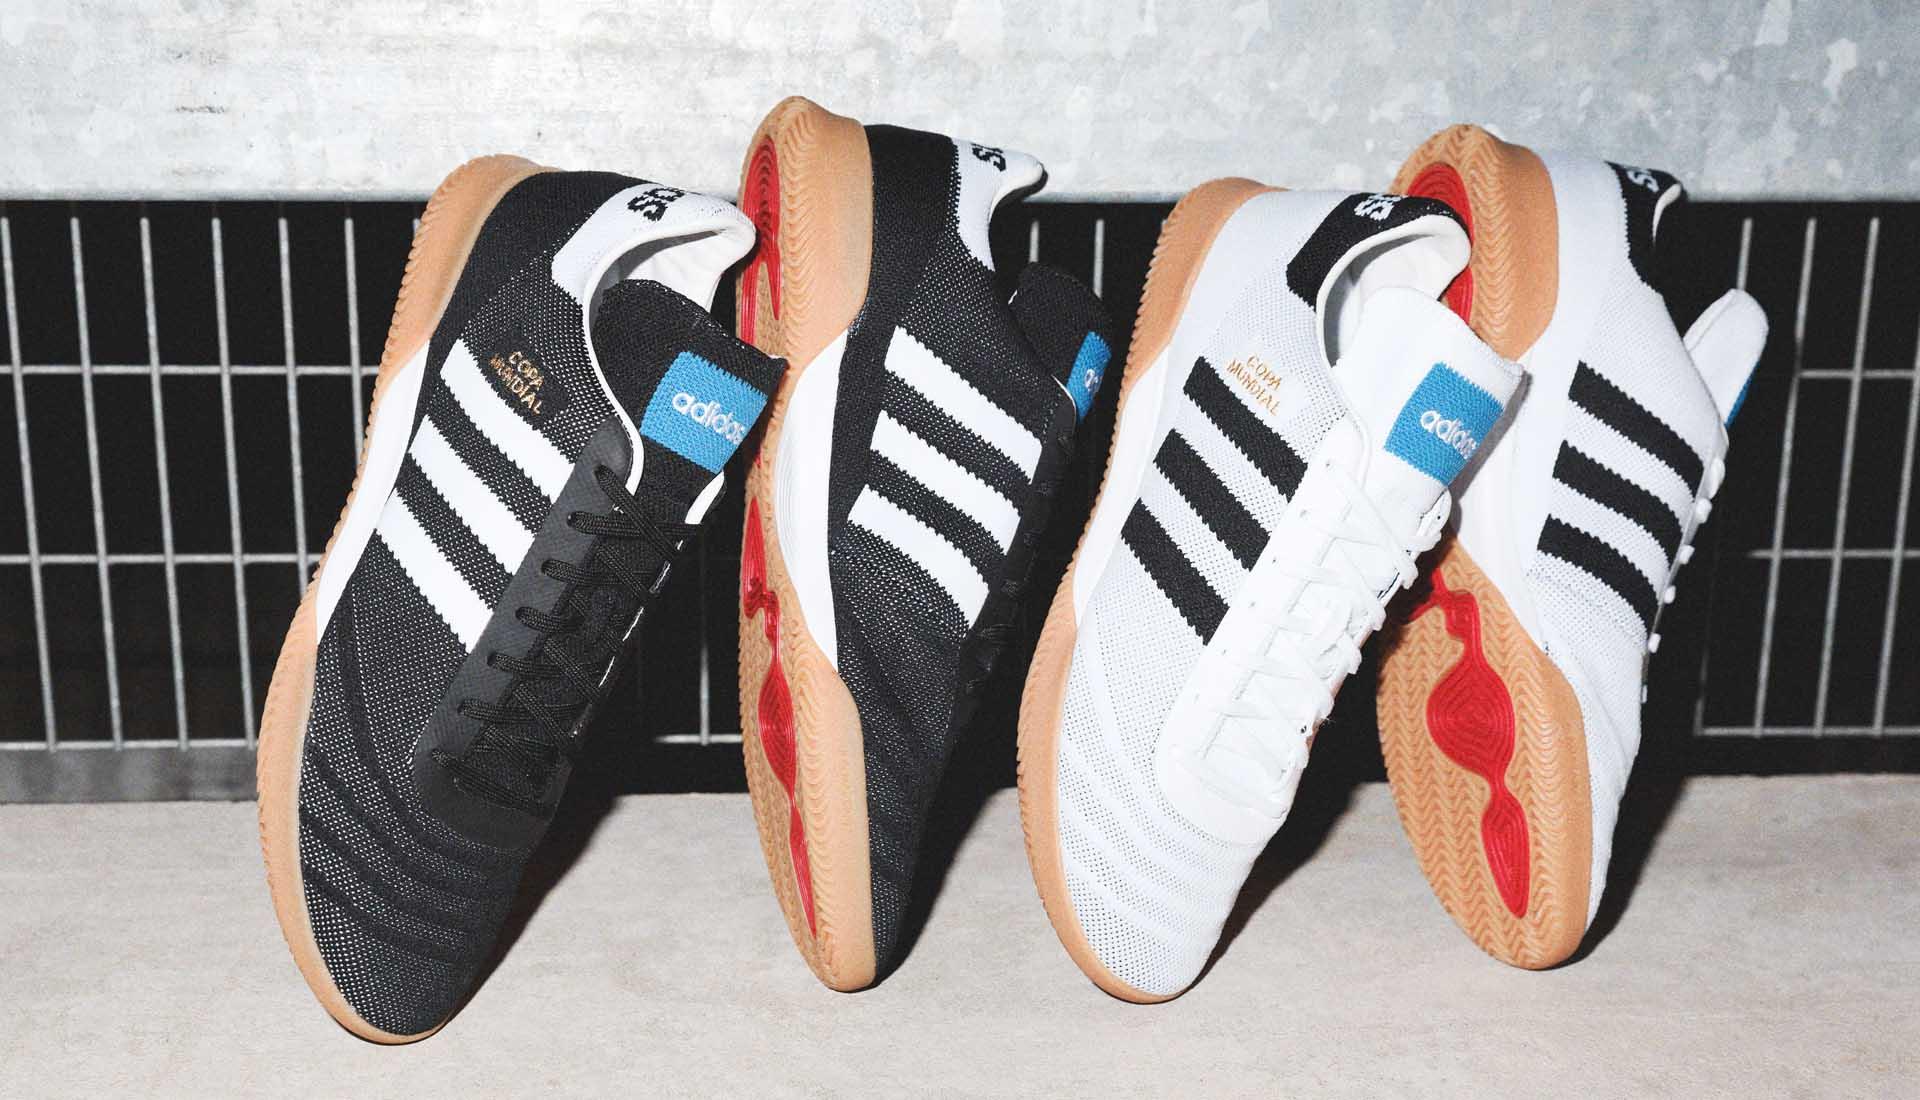 Lanceert Copa Sneakers Mundial Adidas Primeknit nFUXAnf